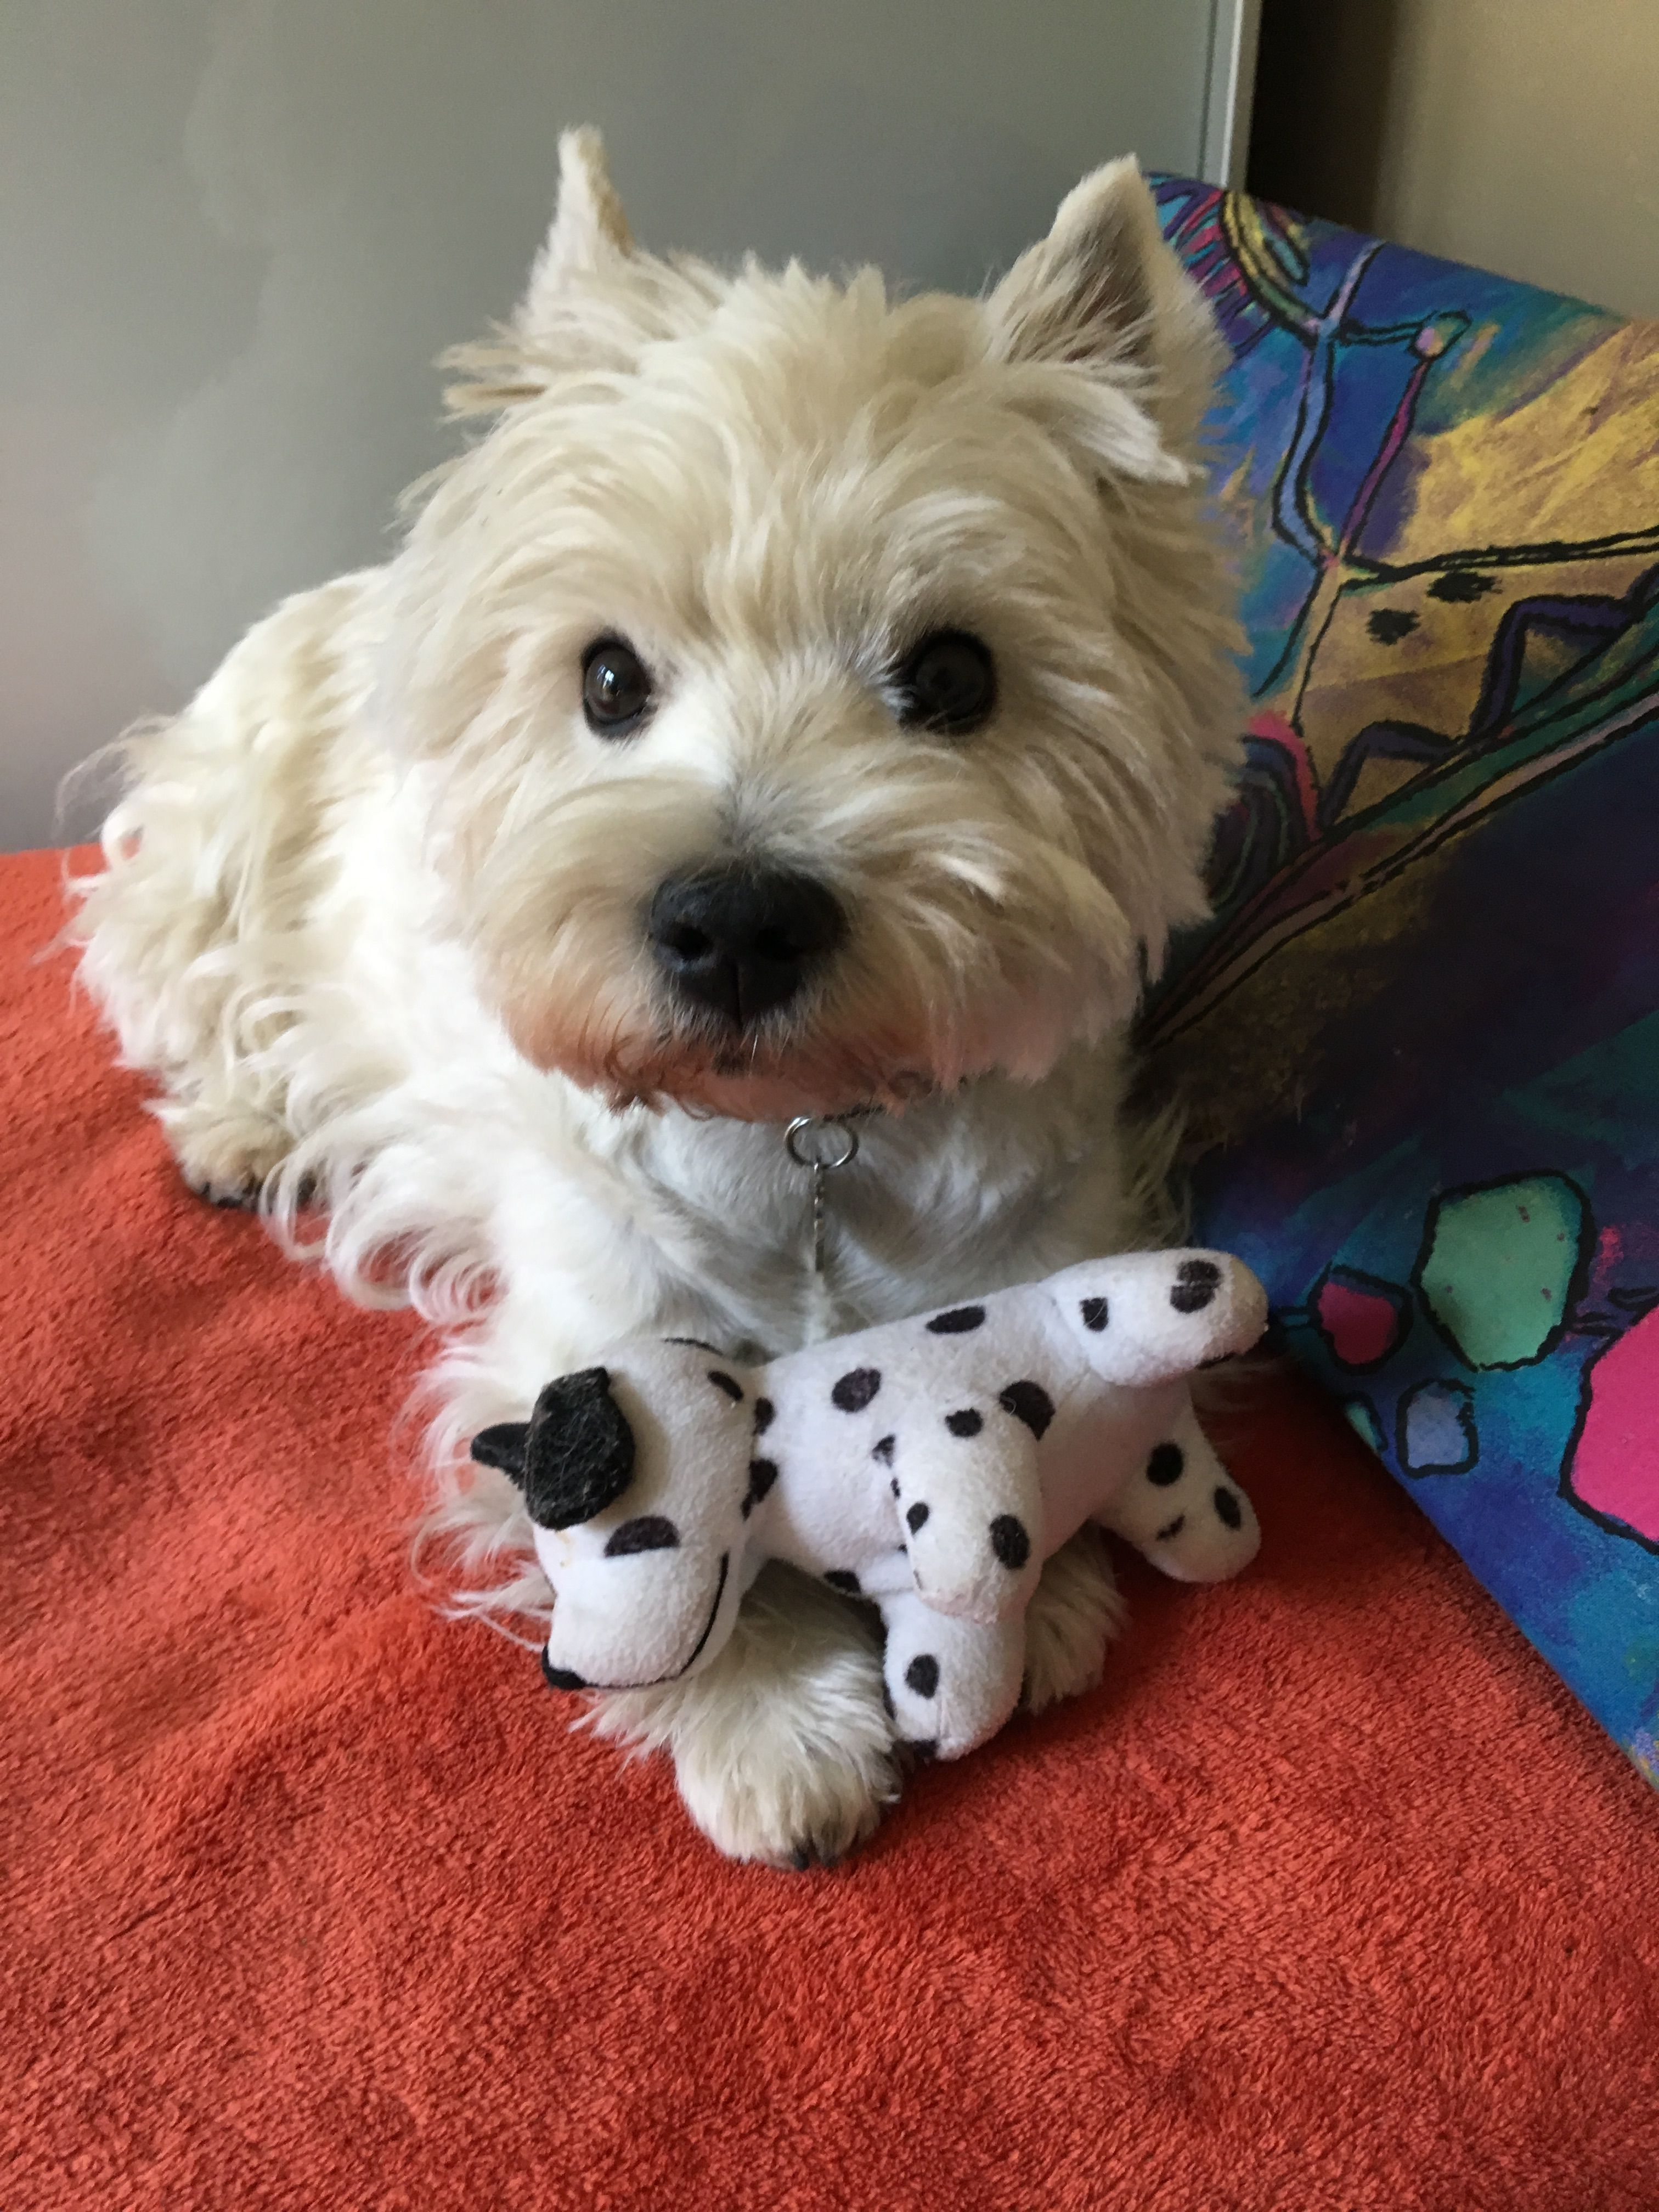 Pin By Marissa Hatfield On Cute Animals Westie Dogs Cute